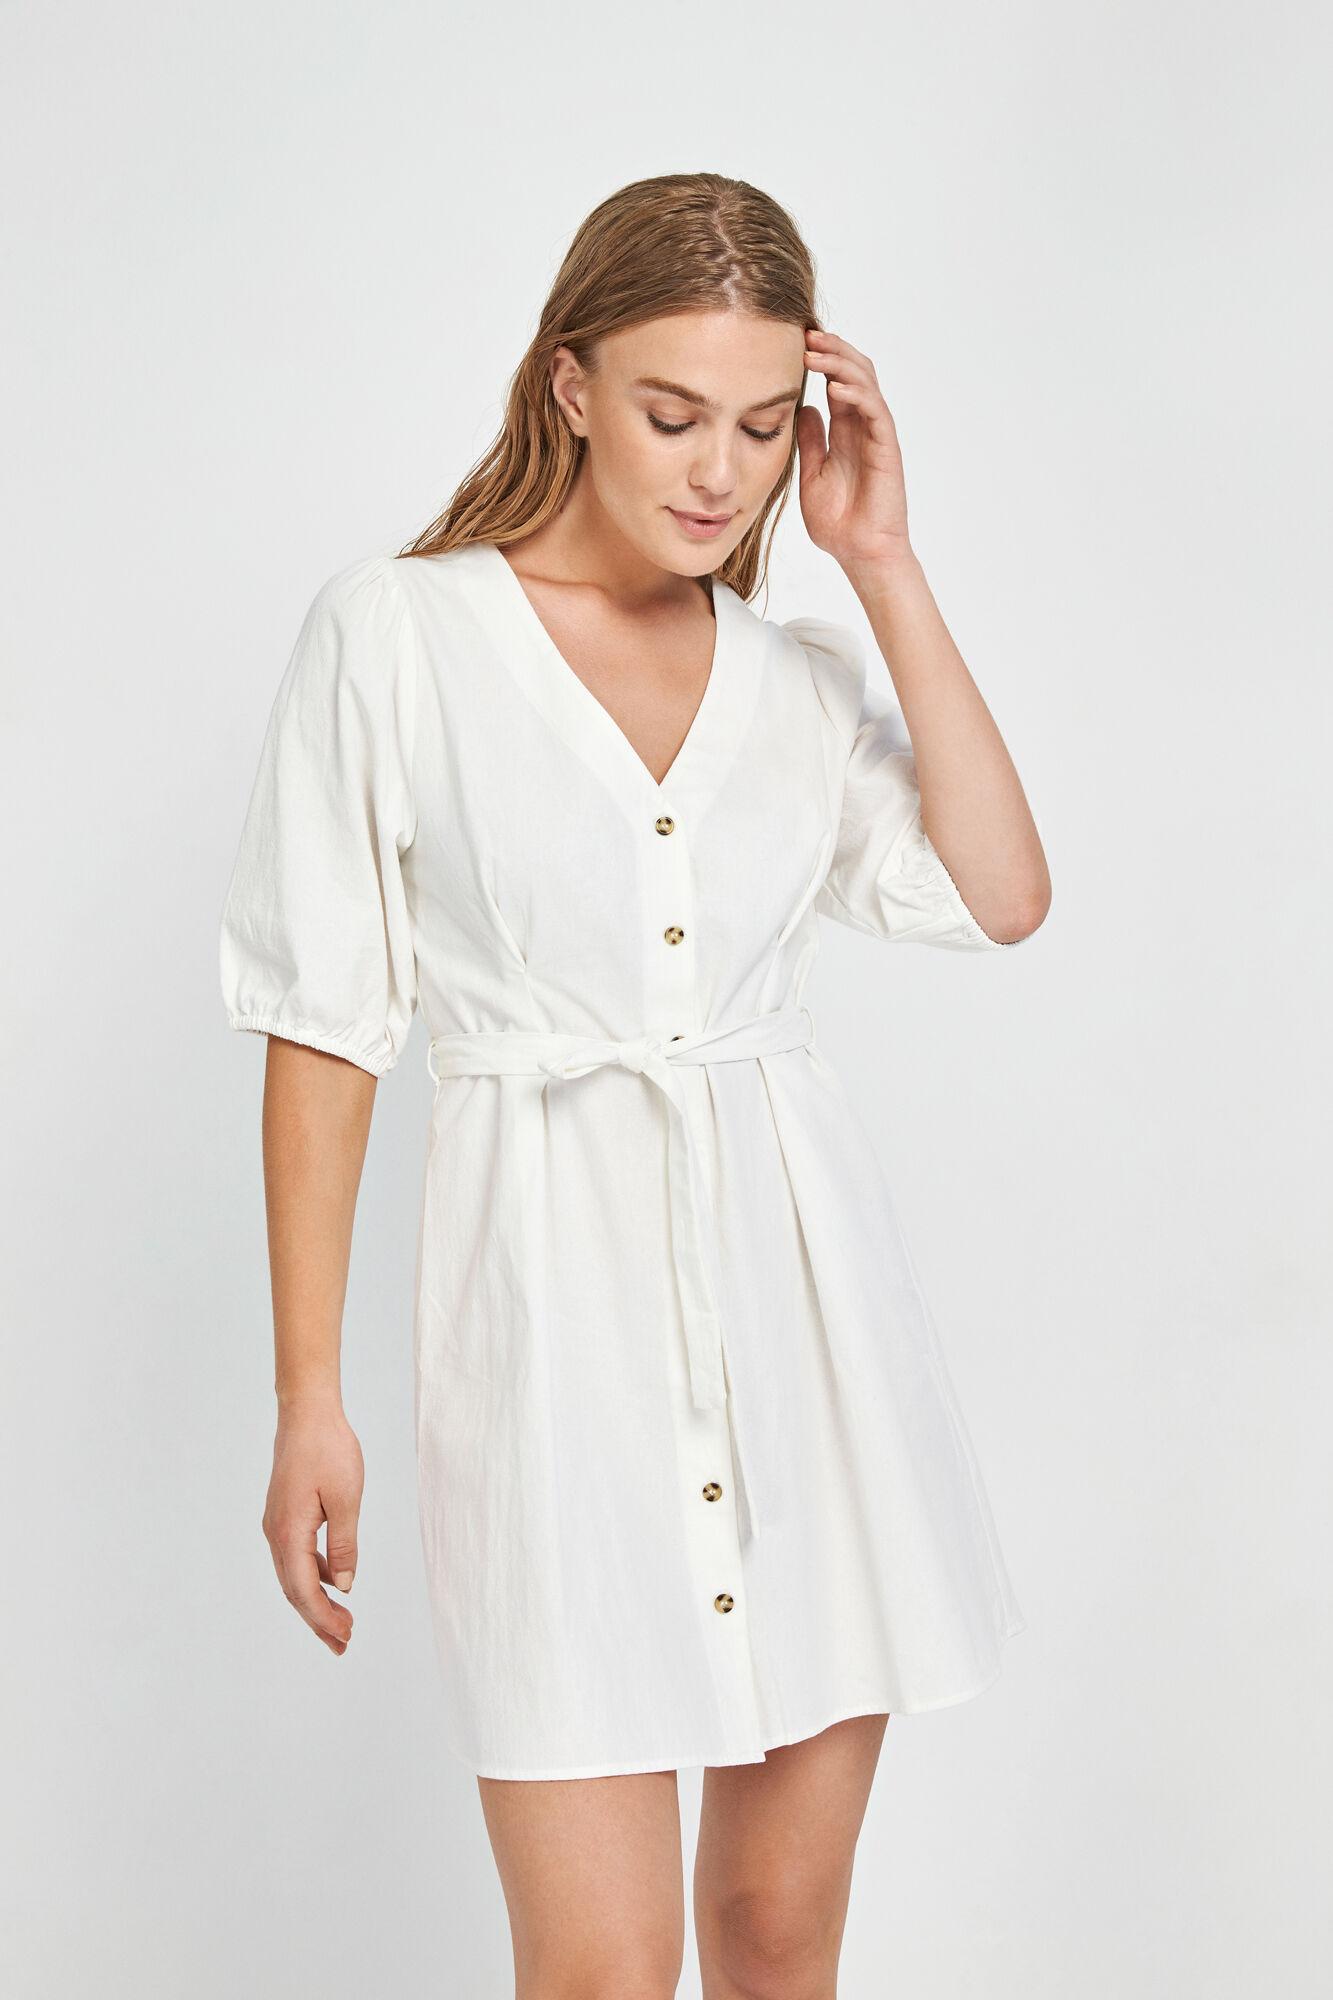 ENSALOON 3/4 DRESS 6753